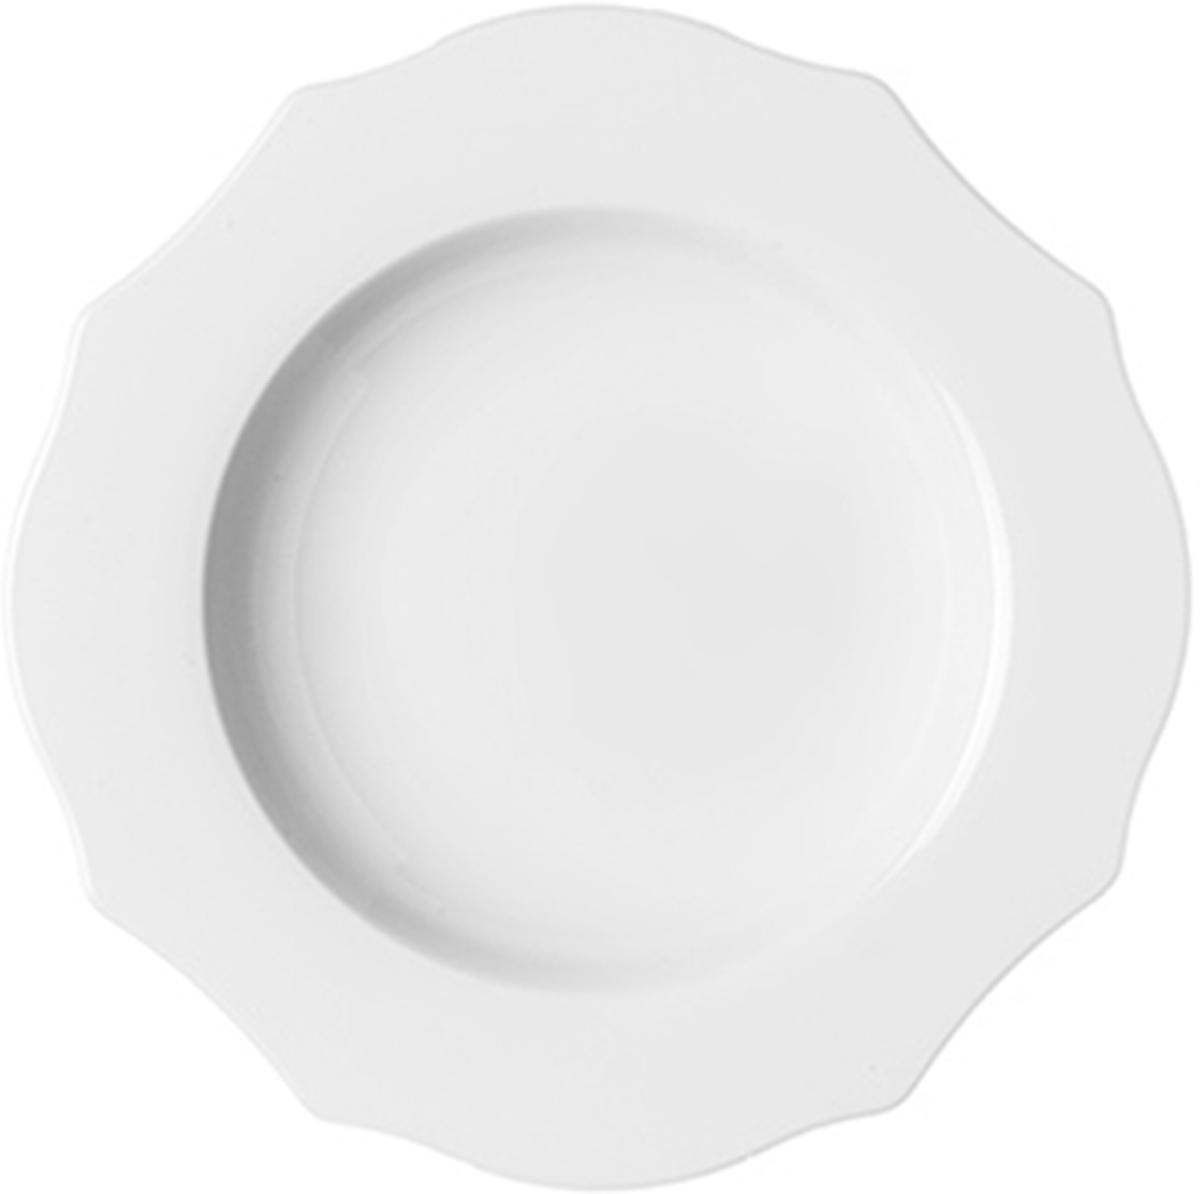 цена на Тарелка для супа Guzzini Belle Epoque, цвет: белый, диаметр 24 см